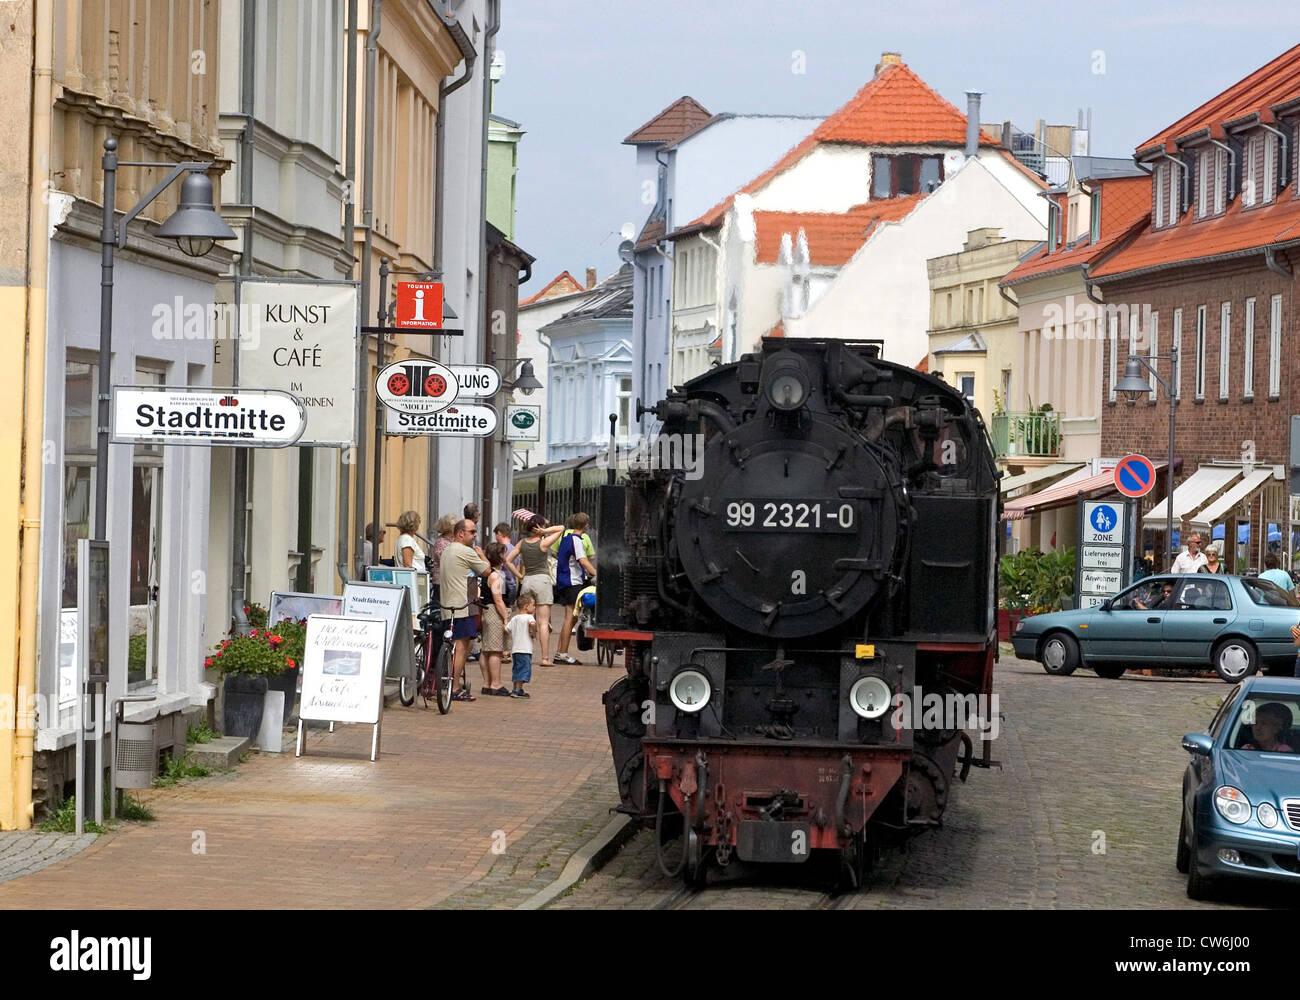 Bad Doberan Baederbahn Molli Bahnhof Innenstadt Stockfoto